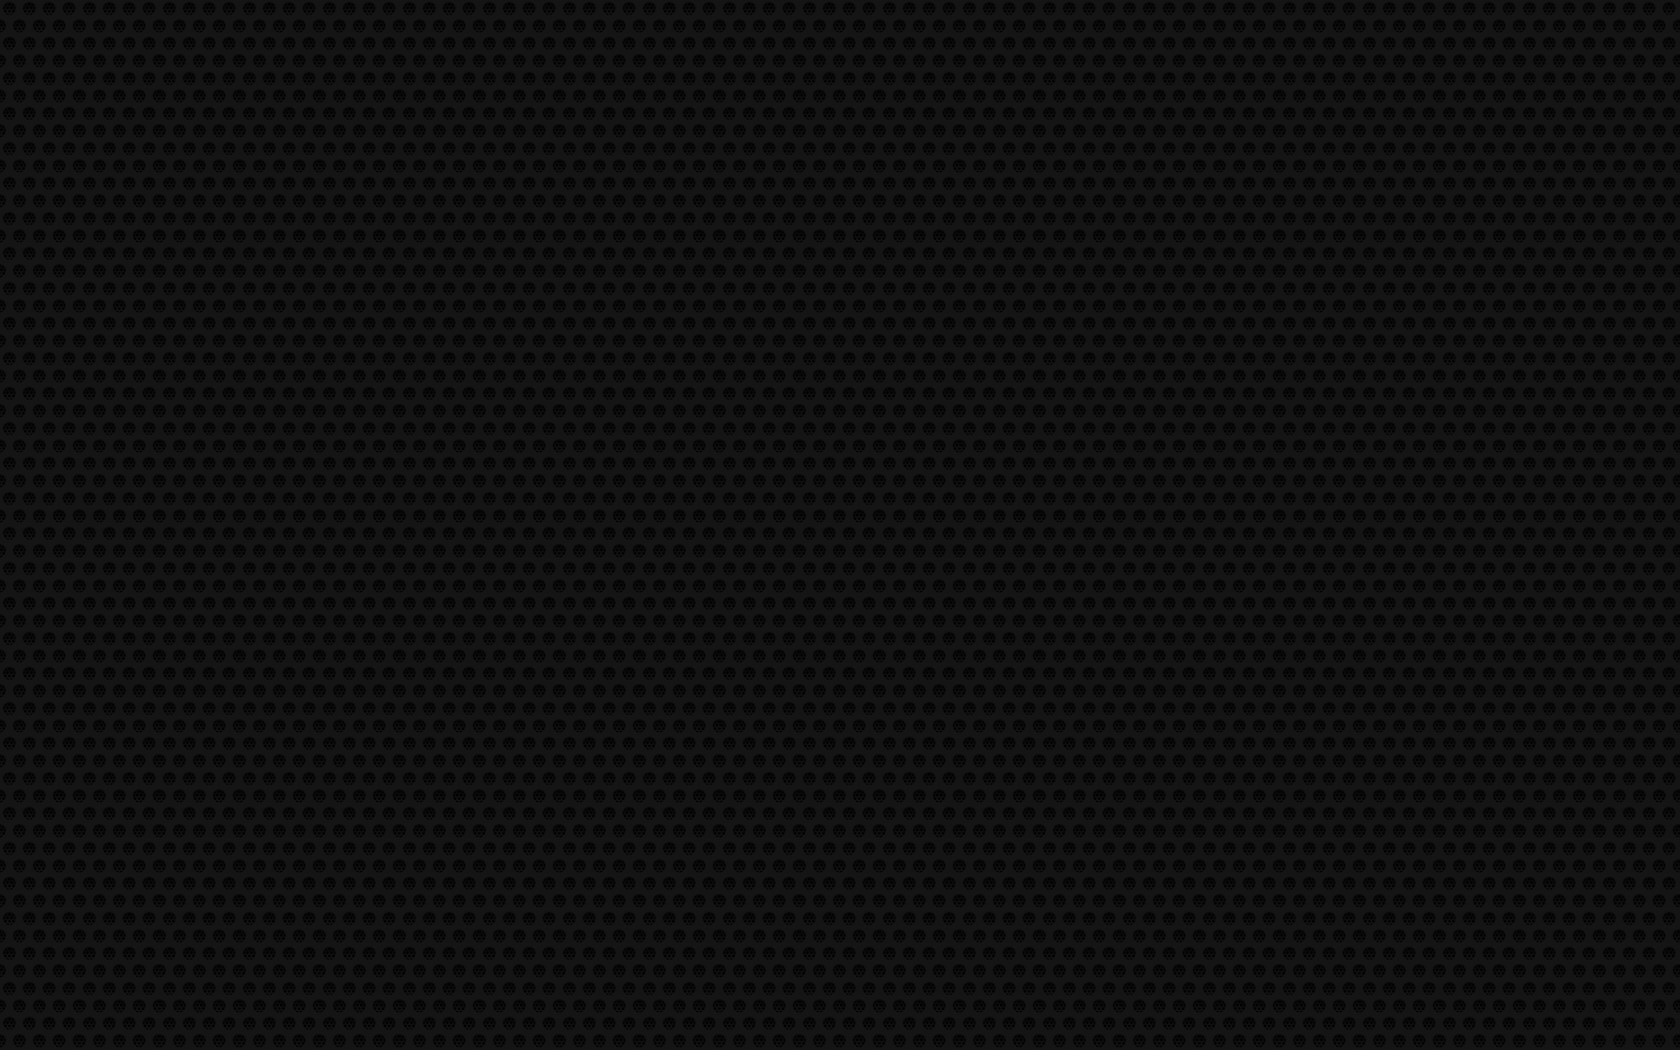 technology background black - photo #24